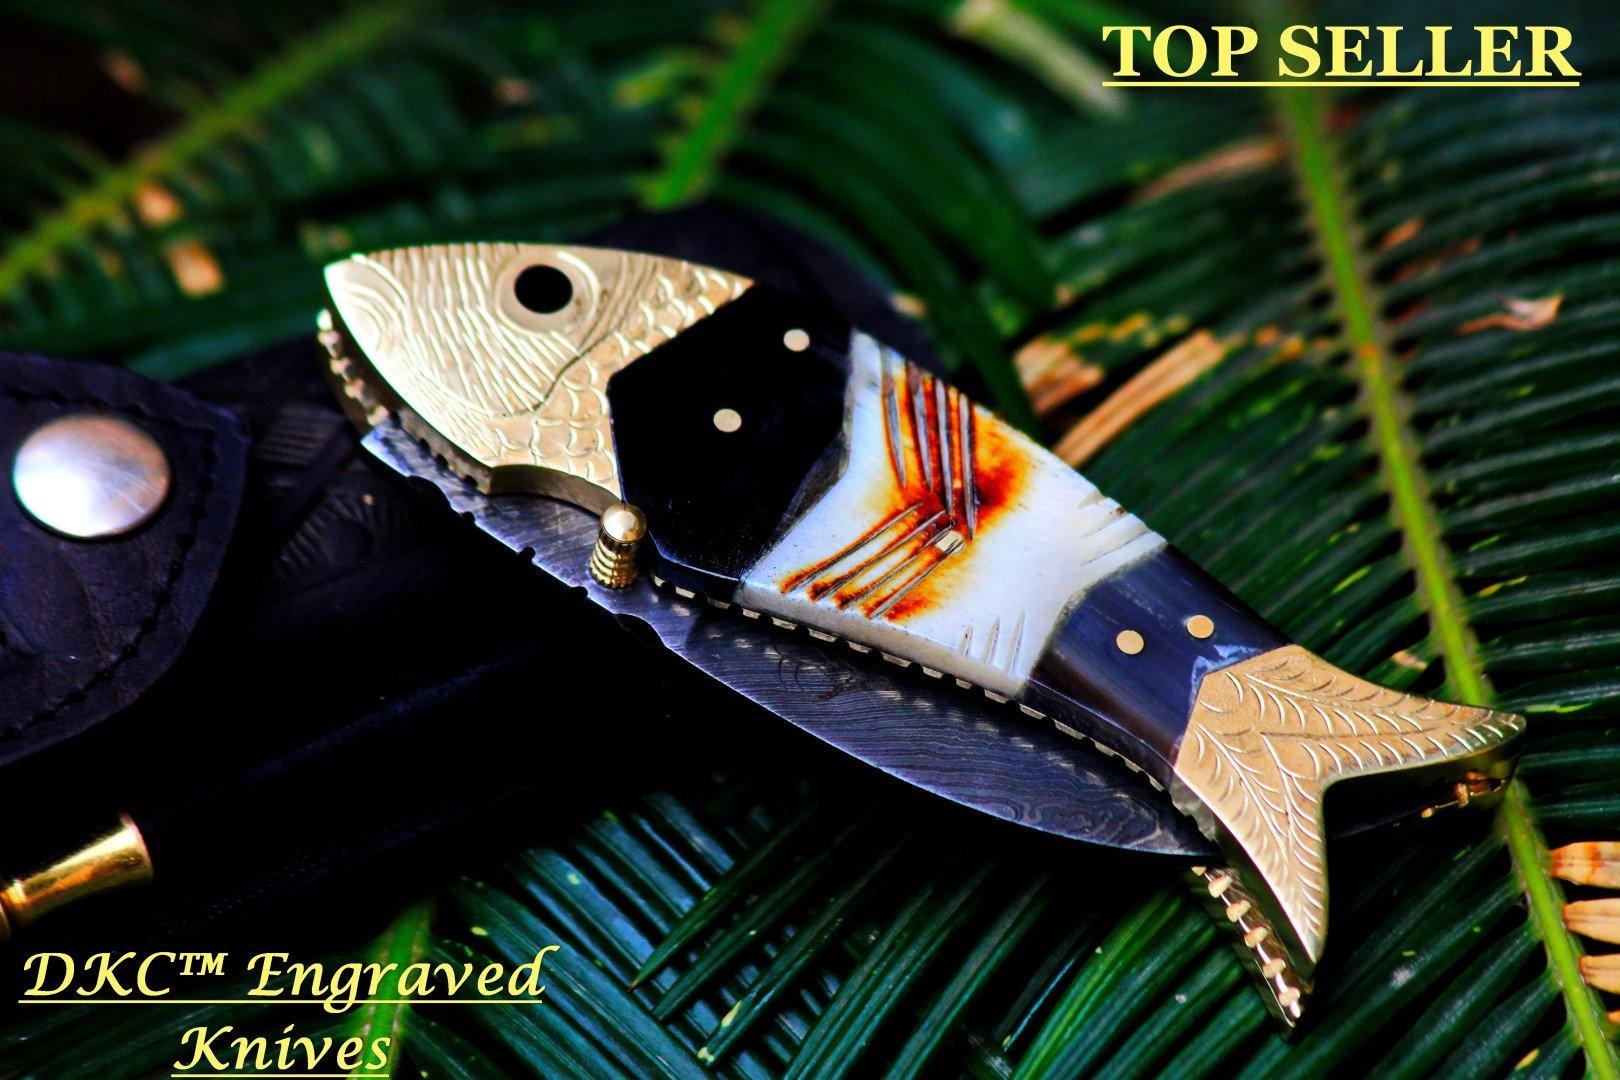 DKC-139 TIGER FISH Bass Trout Fishing Pocket Folding Damascus Hunting Knife Brass & Bone Folded 7.7oz DKC Knives Great Fisherman Gift Bass Fishing Work of Art ! FISHANA SERIES